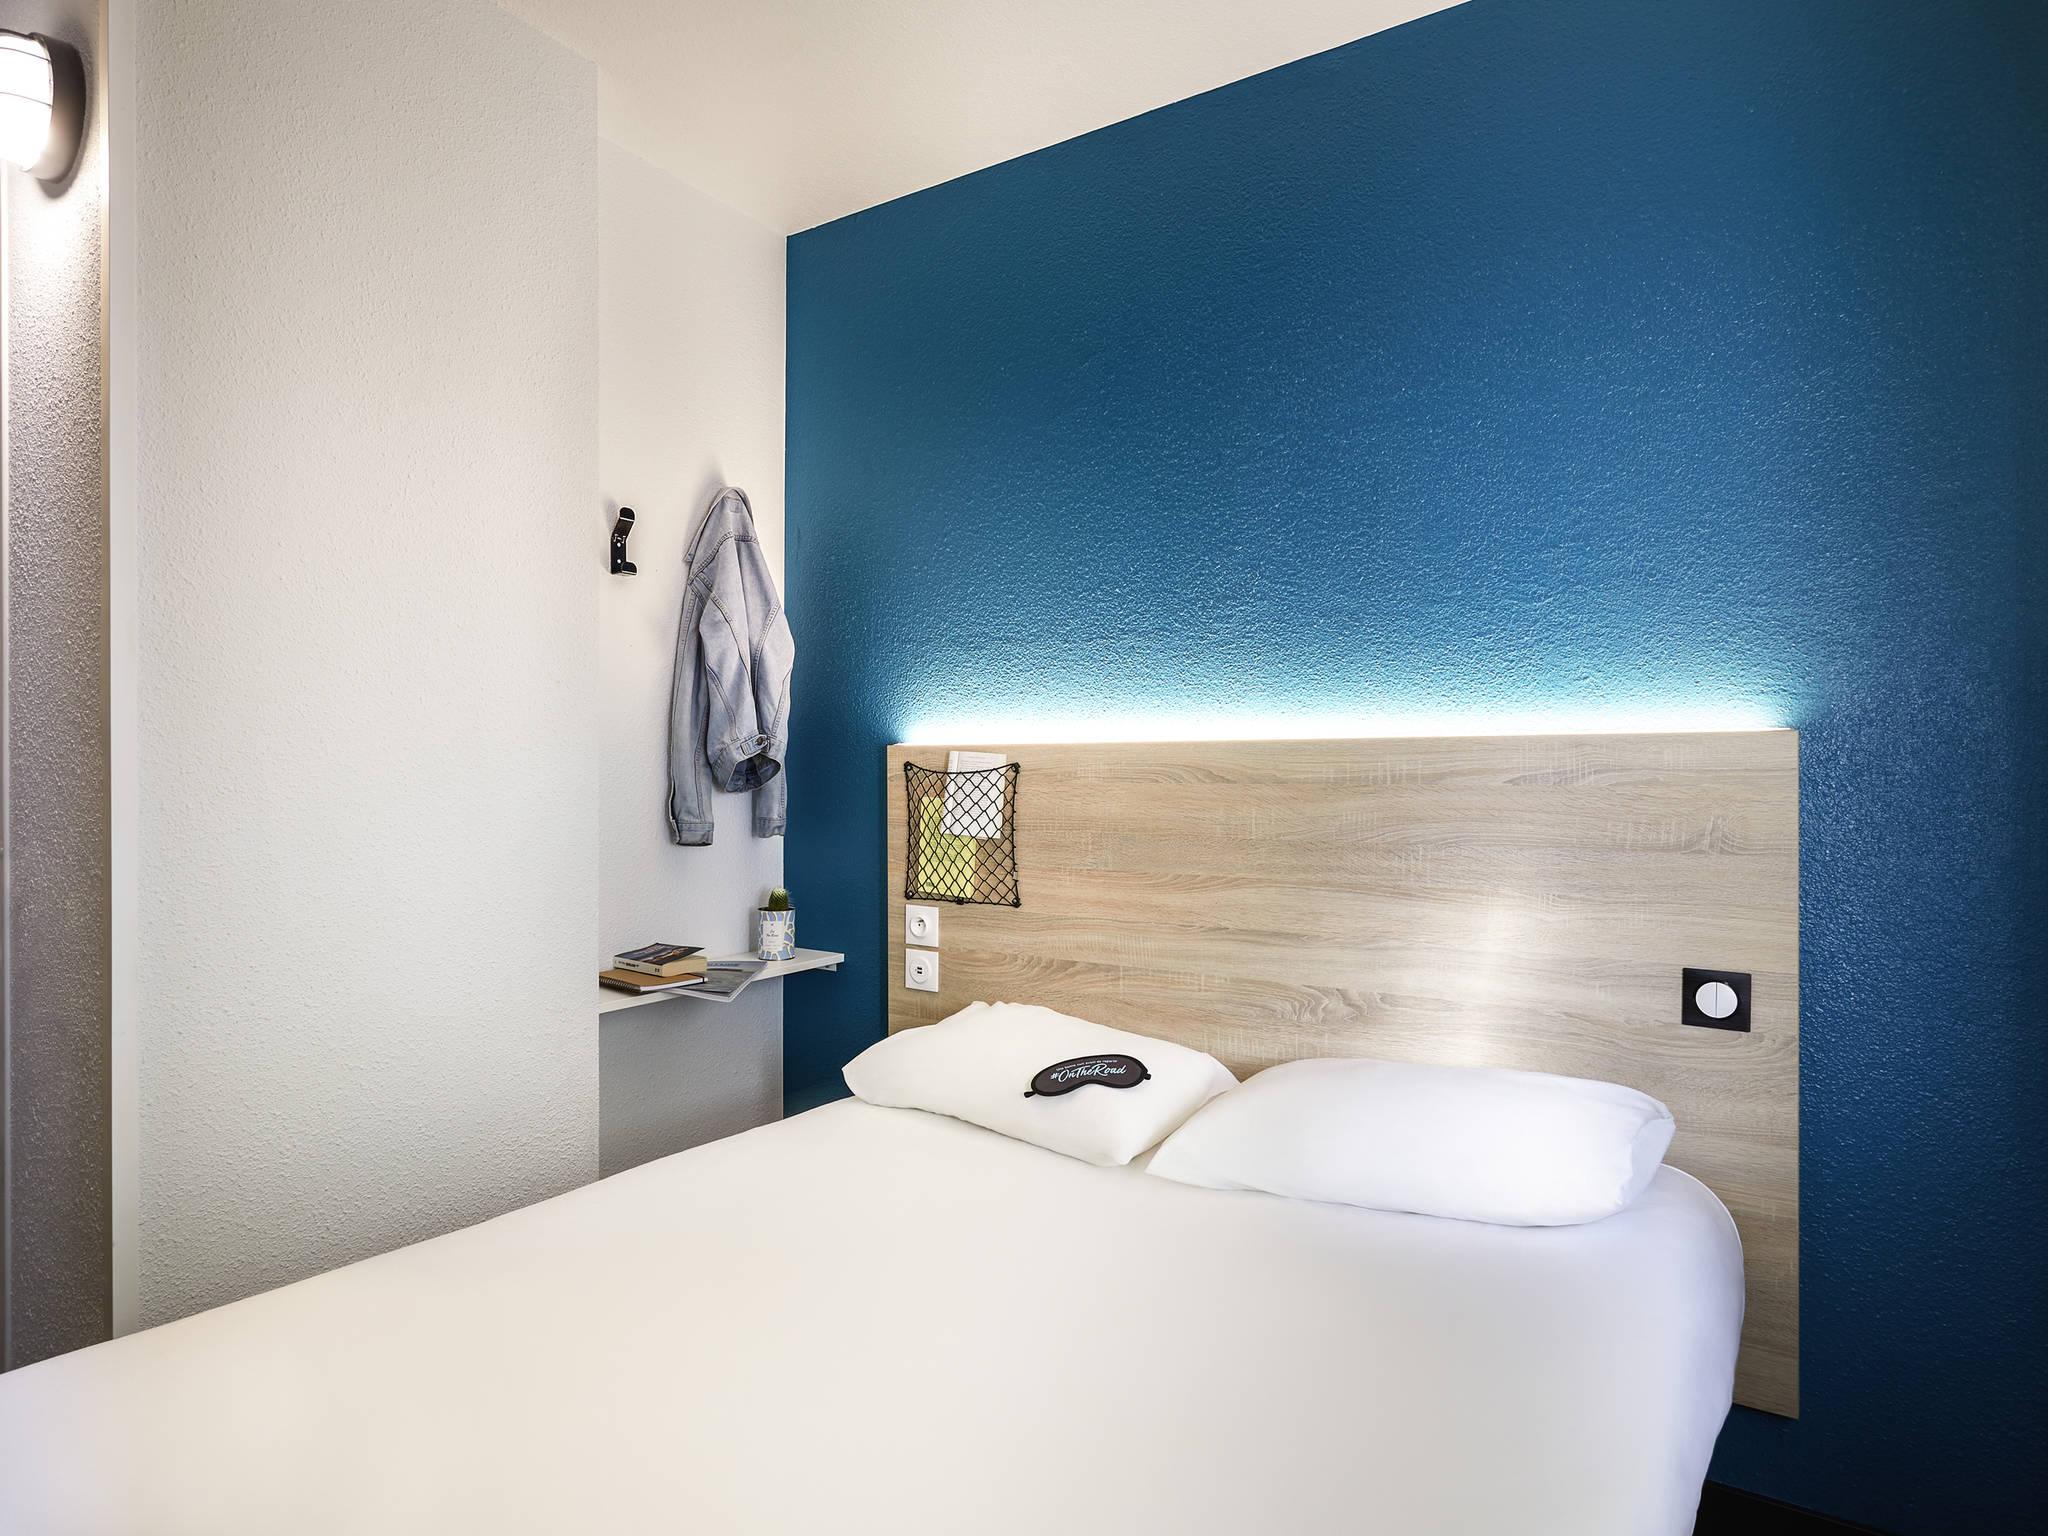 ホテル – hotelF1 Gennevilliers Asnières